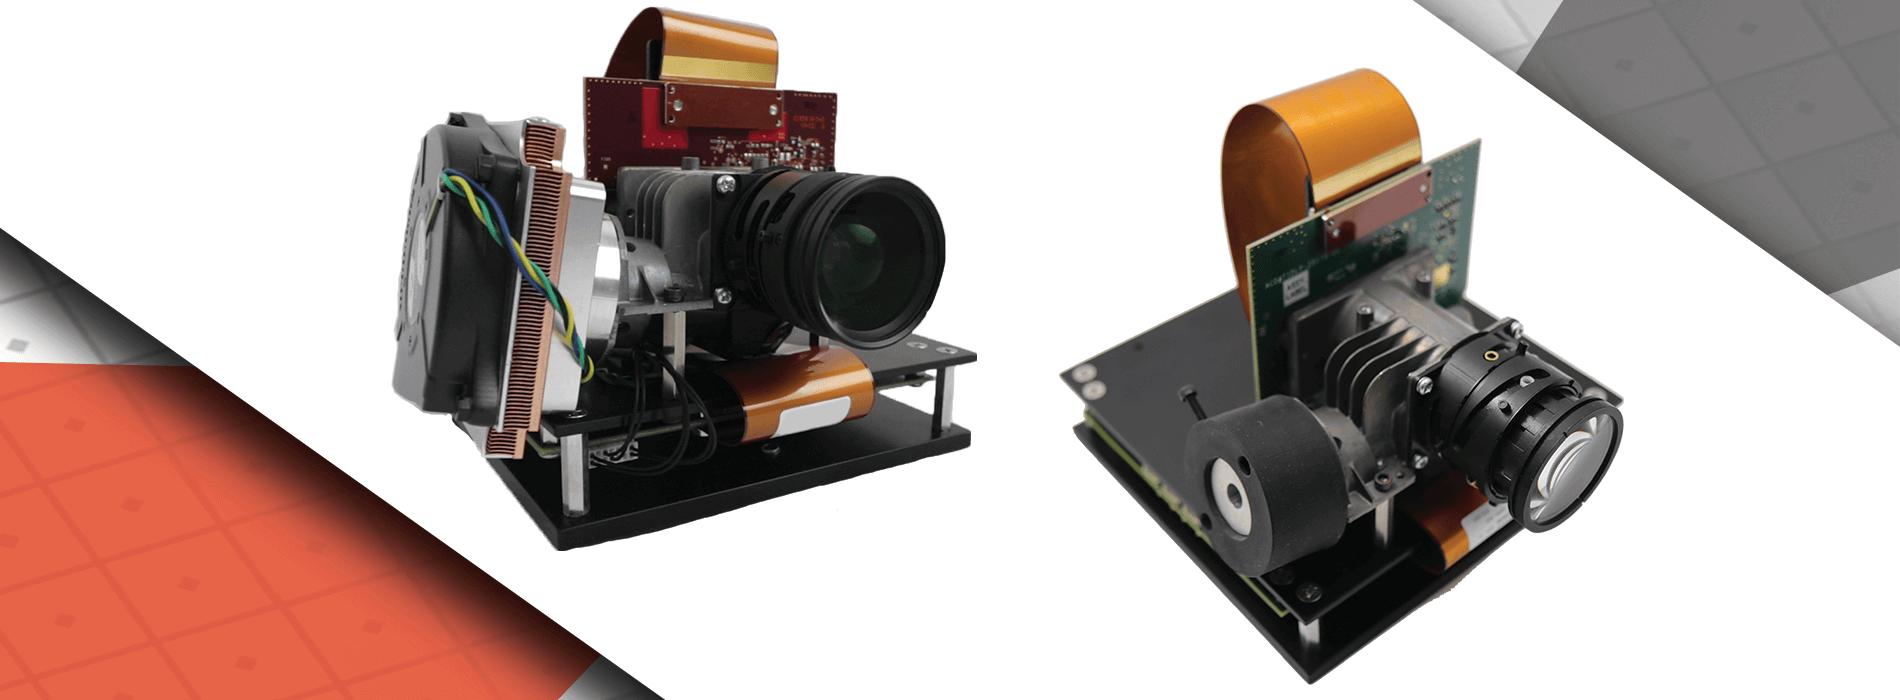 DLi6500 Type-S & Type-A Optics Bundles Header